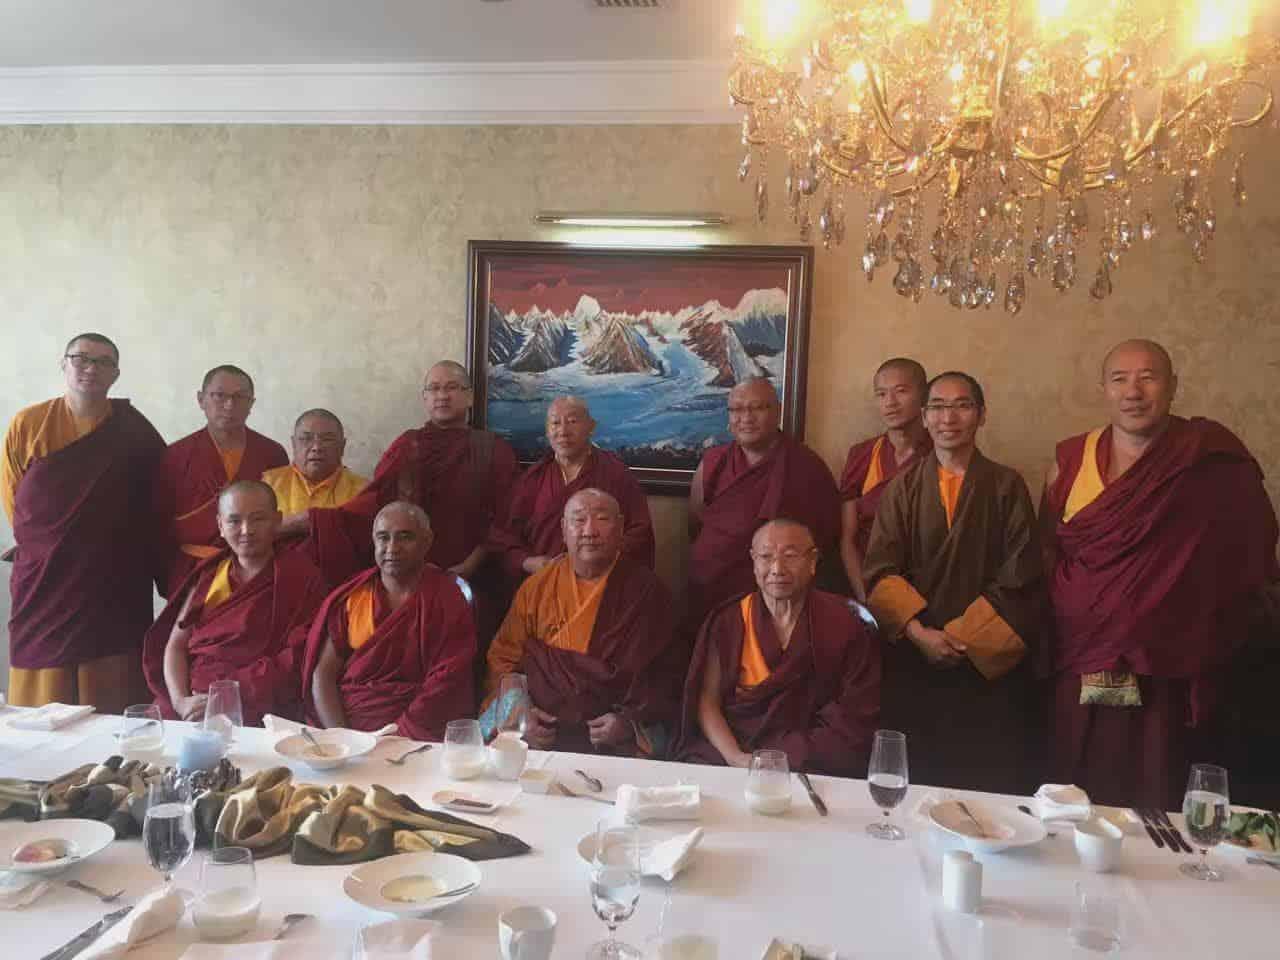 gosok-rinpoche-mongolia-2016-4cdd32e047f22a326a589d58a80600e